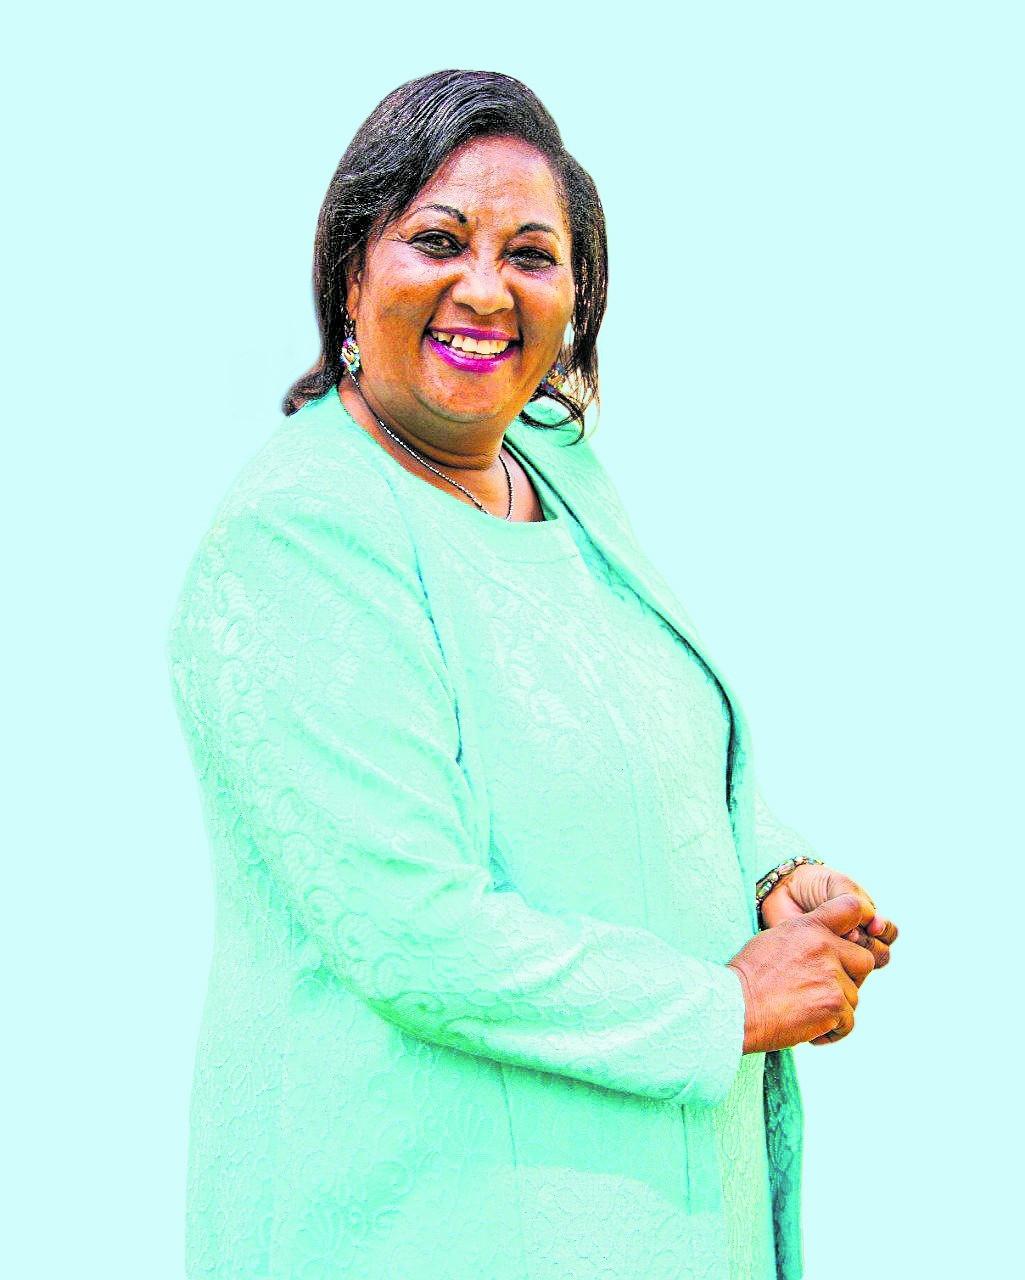 Esther Wanjiku Wachira